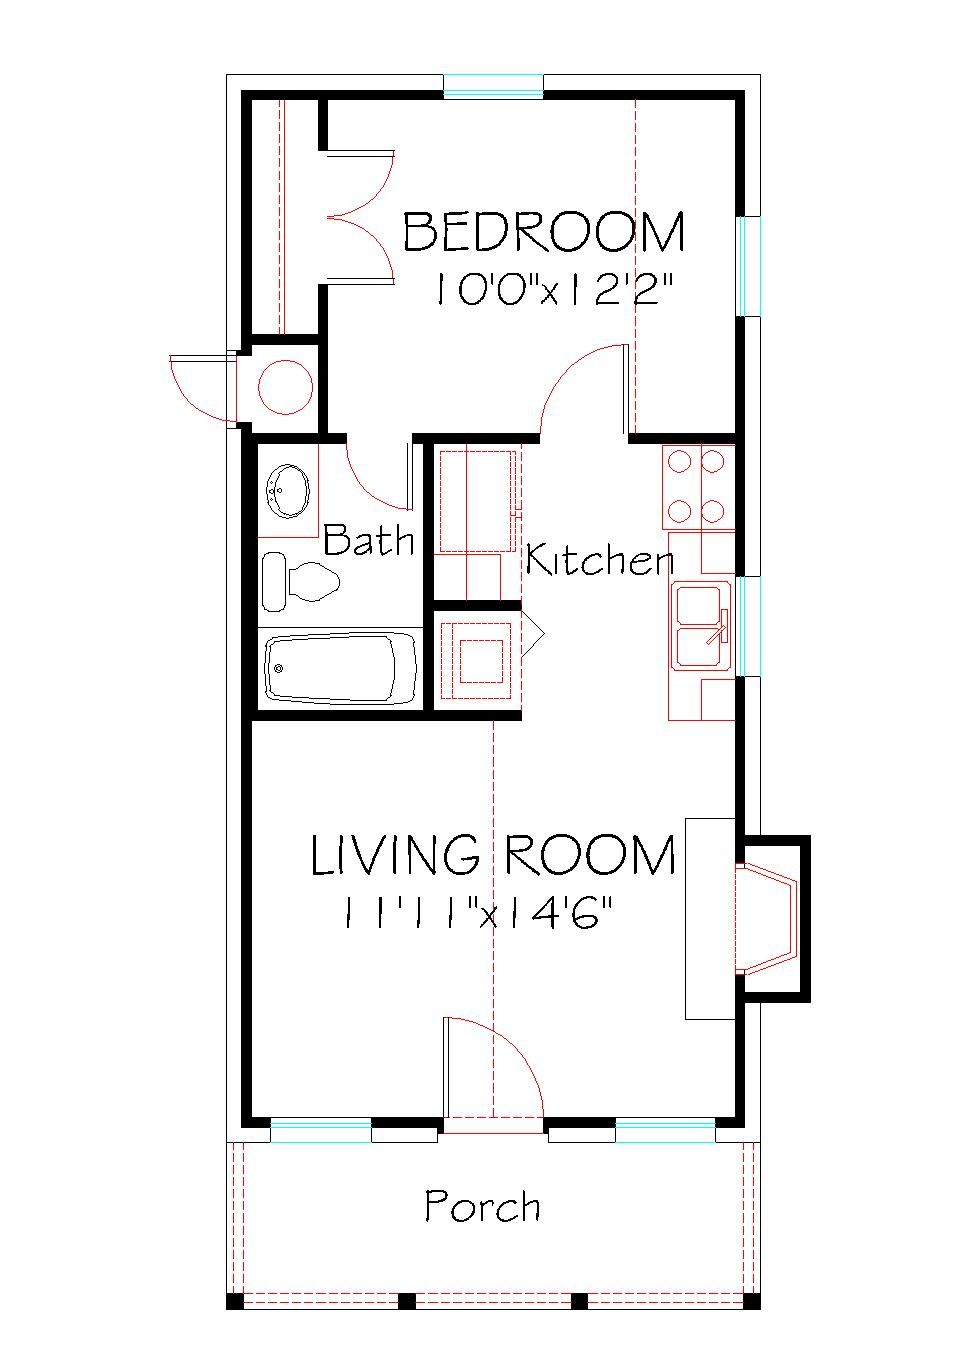 520-149 FLR PLAN-Model | Small house floor plans, Tiny house ... on big house floor plans ranch, home floor plans ranch, townhouse floor plans ranch, tiny living room ranch,